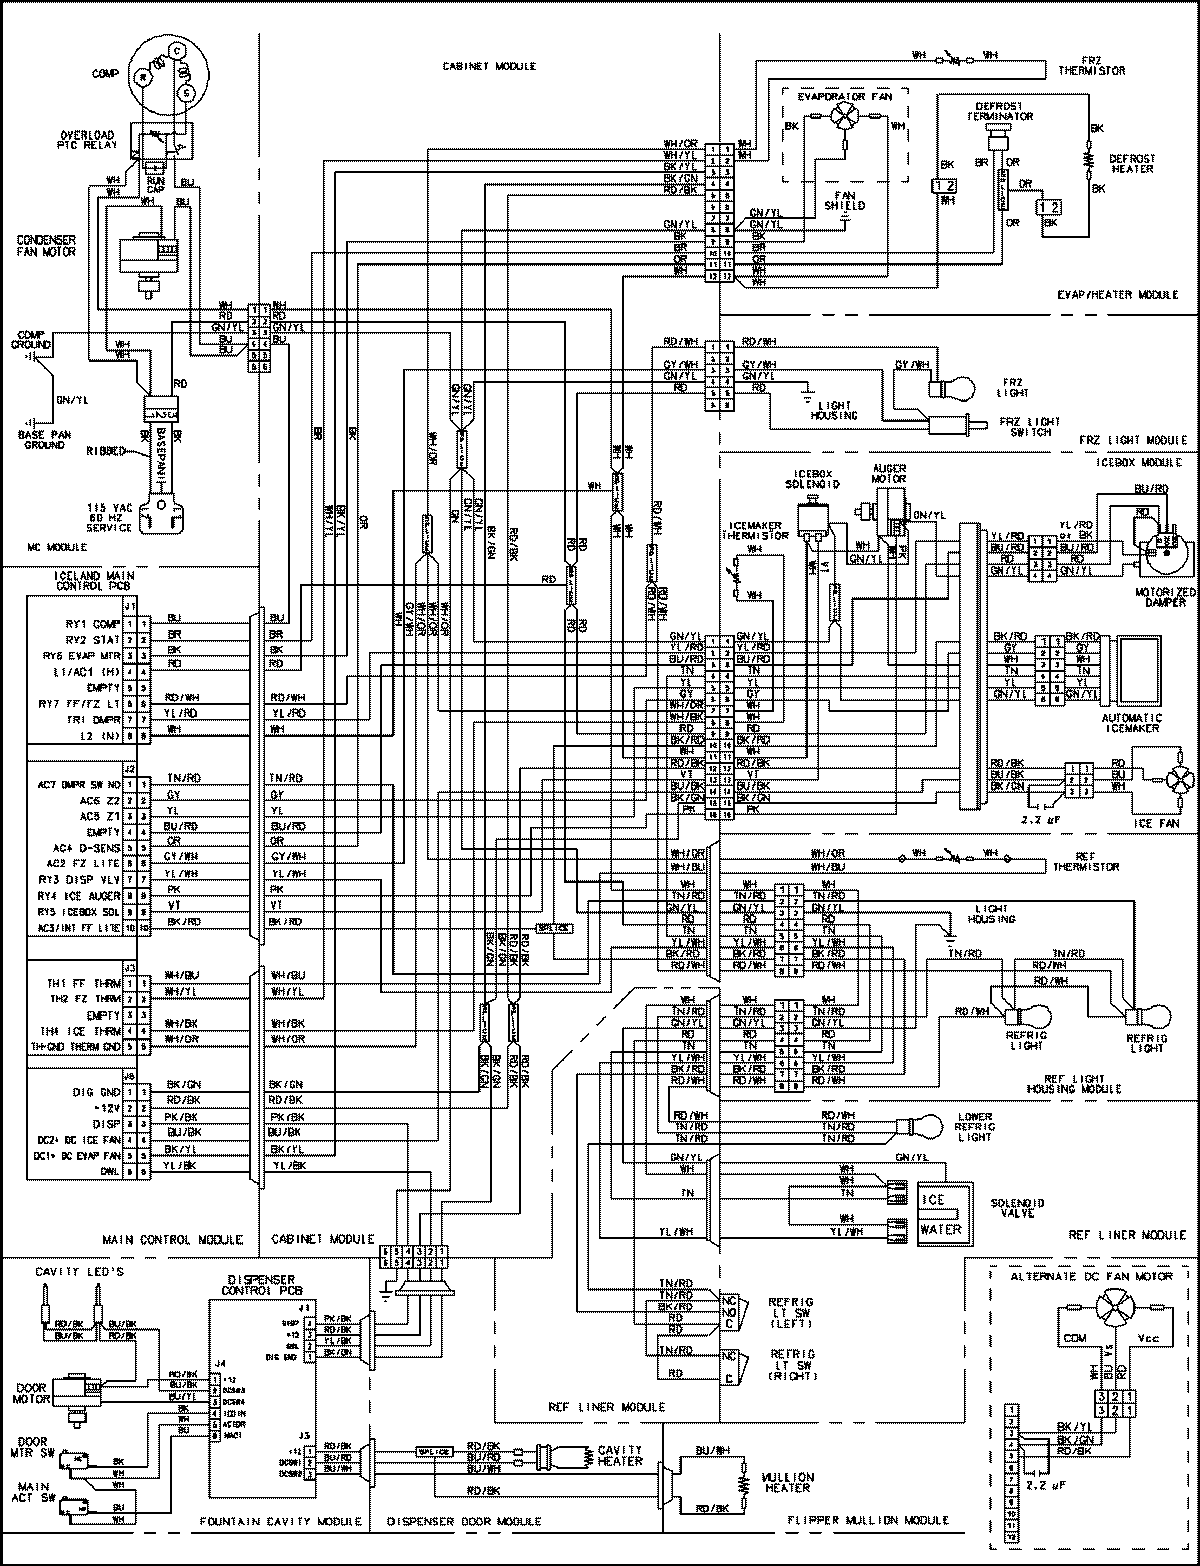 whirlpool refrigerator wiring diagram [ 1200 x 1566 Pixel ]